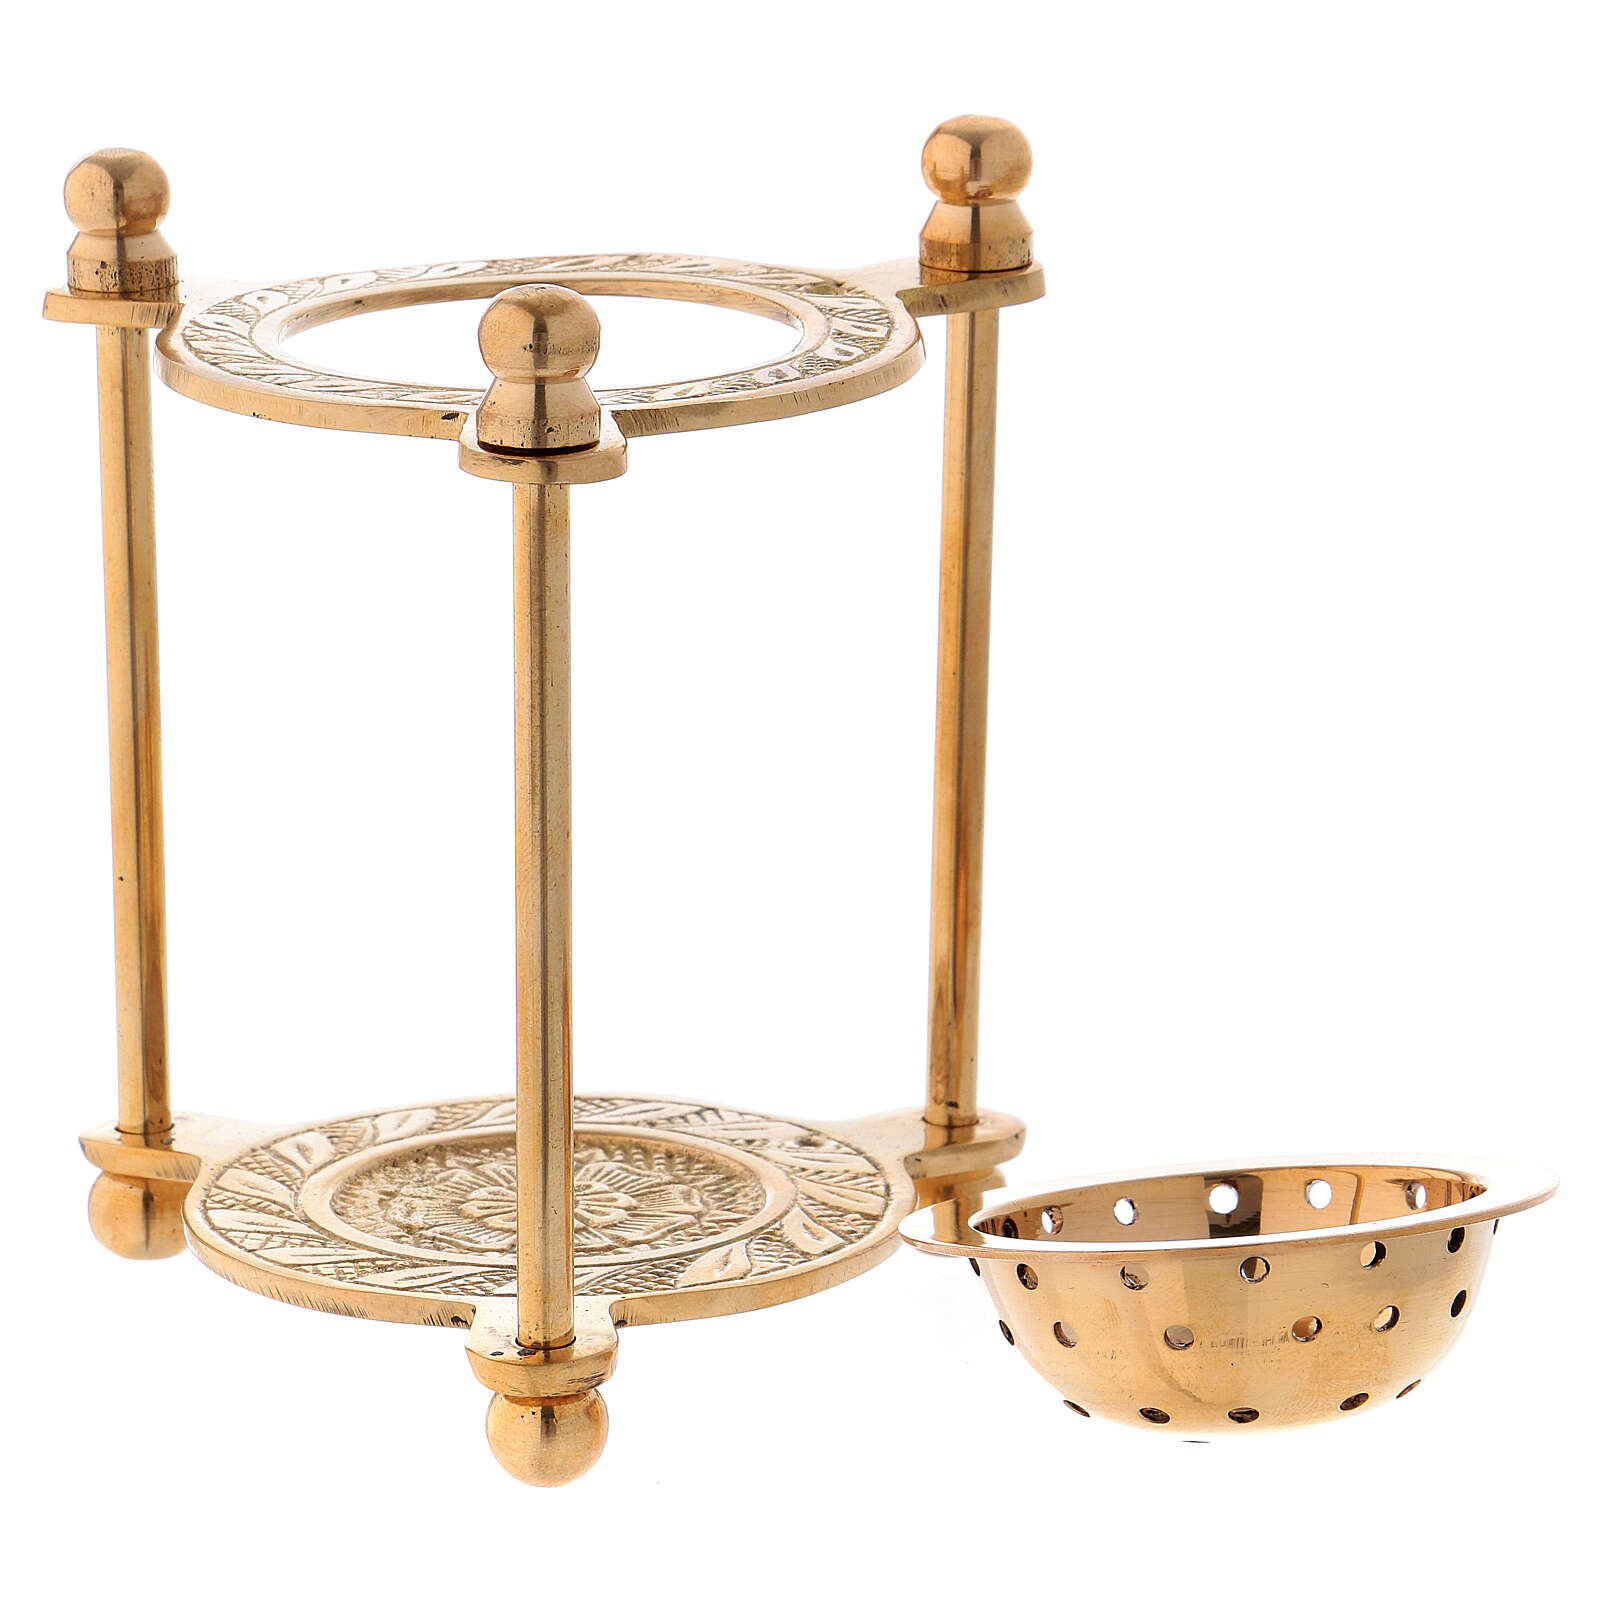 Triangular incense burner in gold plated polish brass 4 in 3